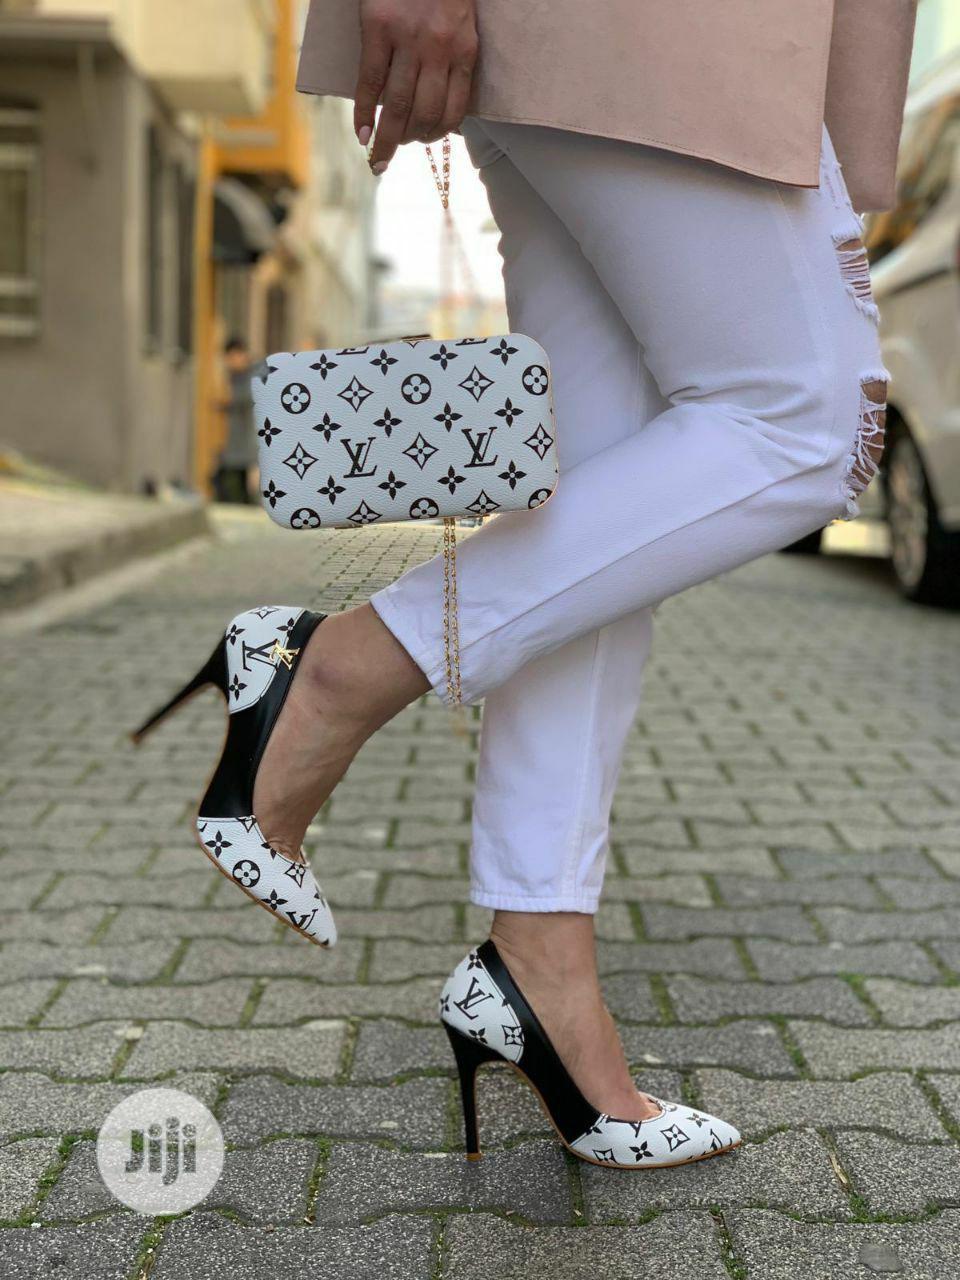 Louis Vuitton Designer's Set Of Shoe And Bag